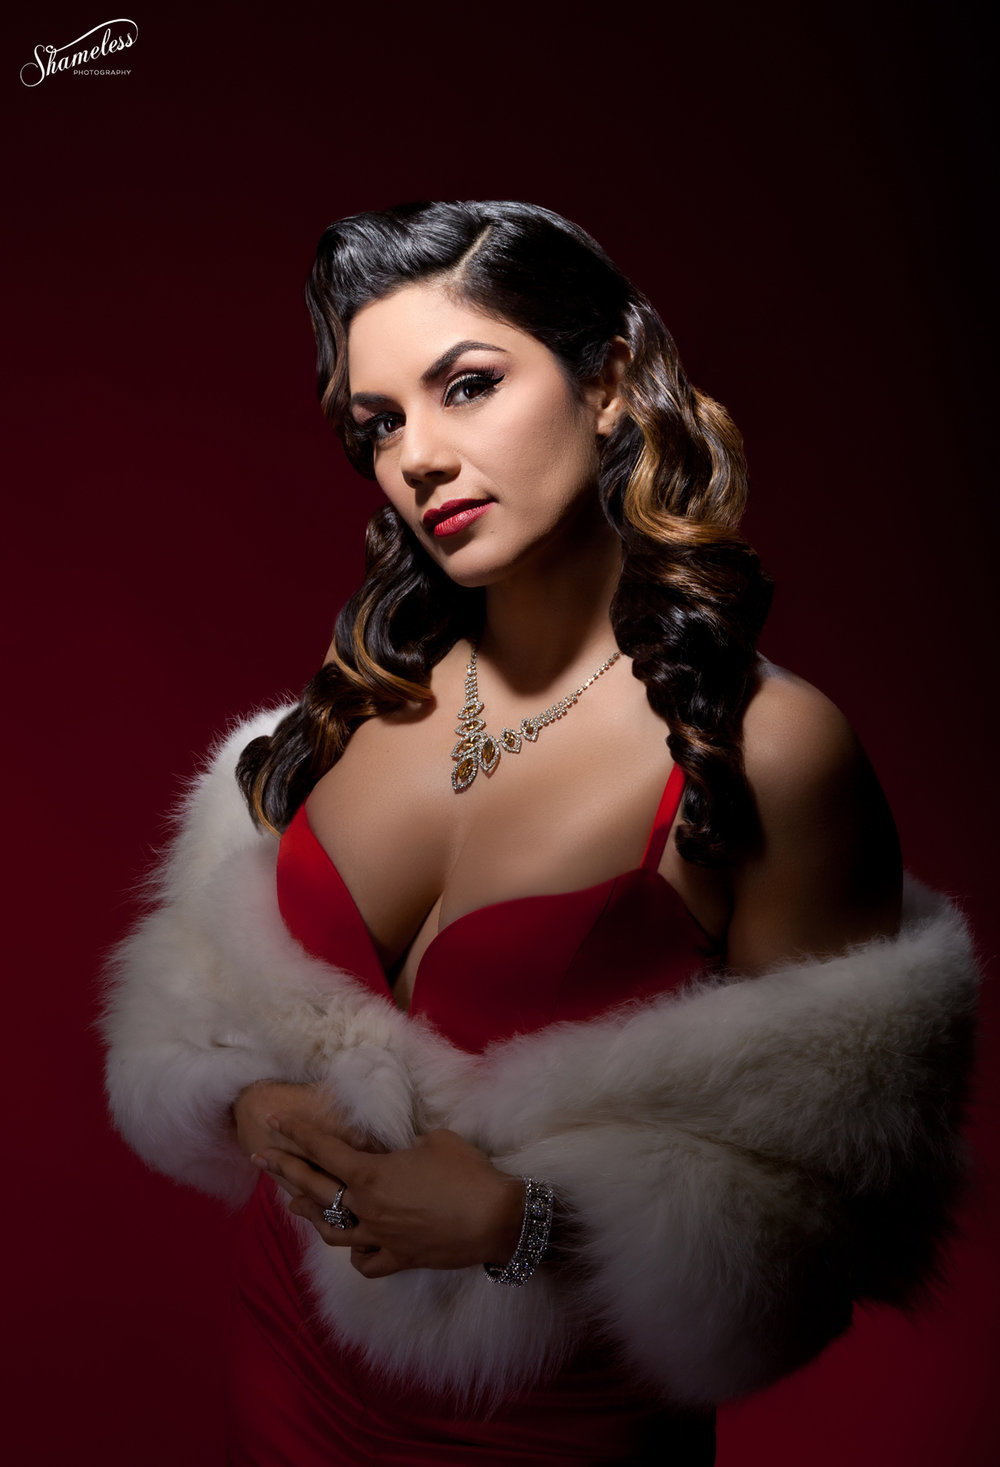 Shivani-WebReady-CareyLynne-01.jpg